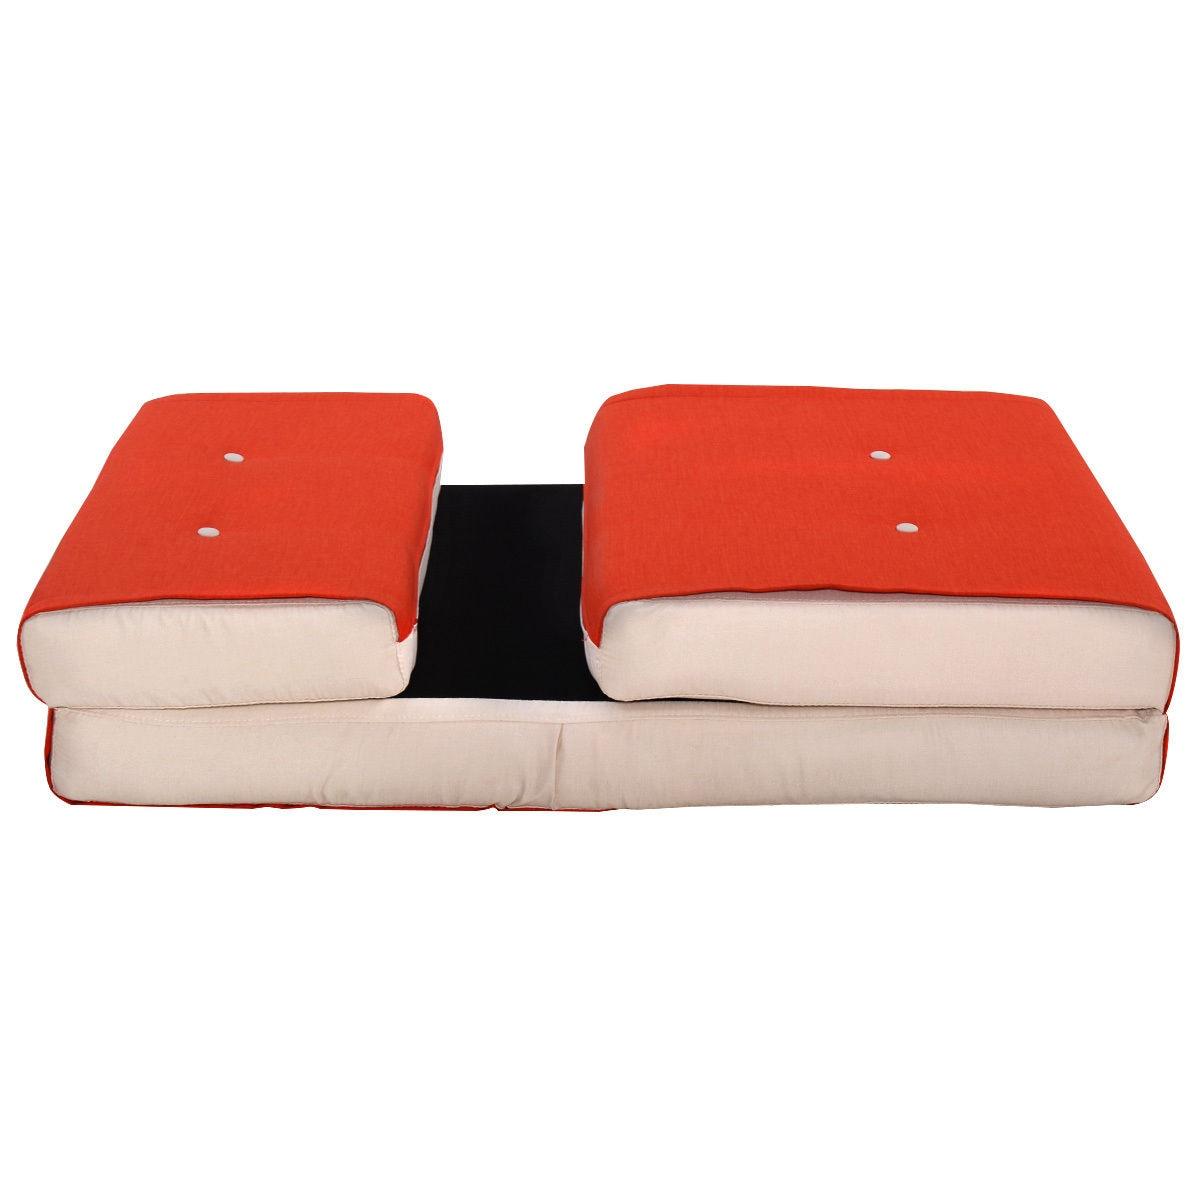 Giantex Folding Sofa Bed Modern Convertible Split Back Linen Futon ...